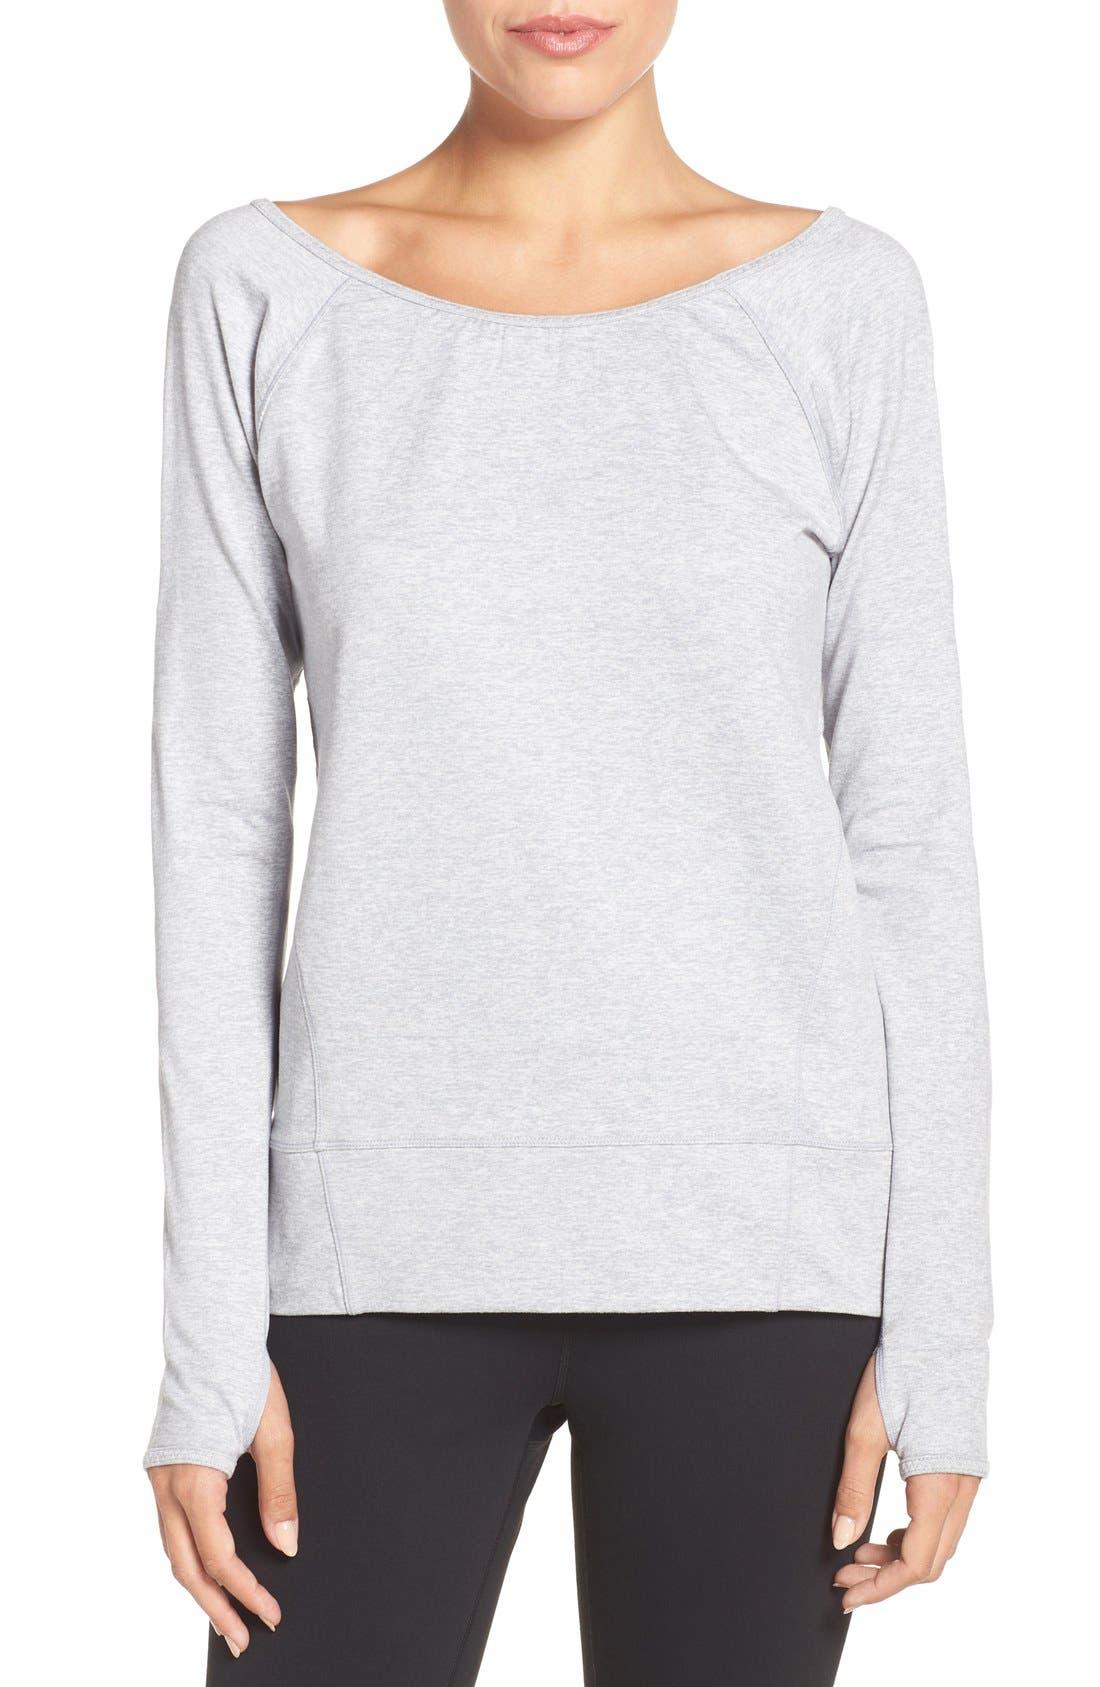 Alternate Image 1 Selected - Zella Etoile Pullover Sweatshirt